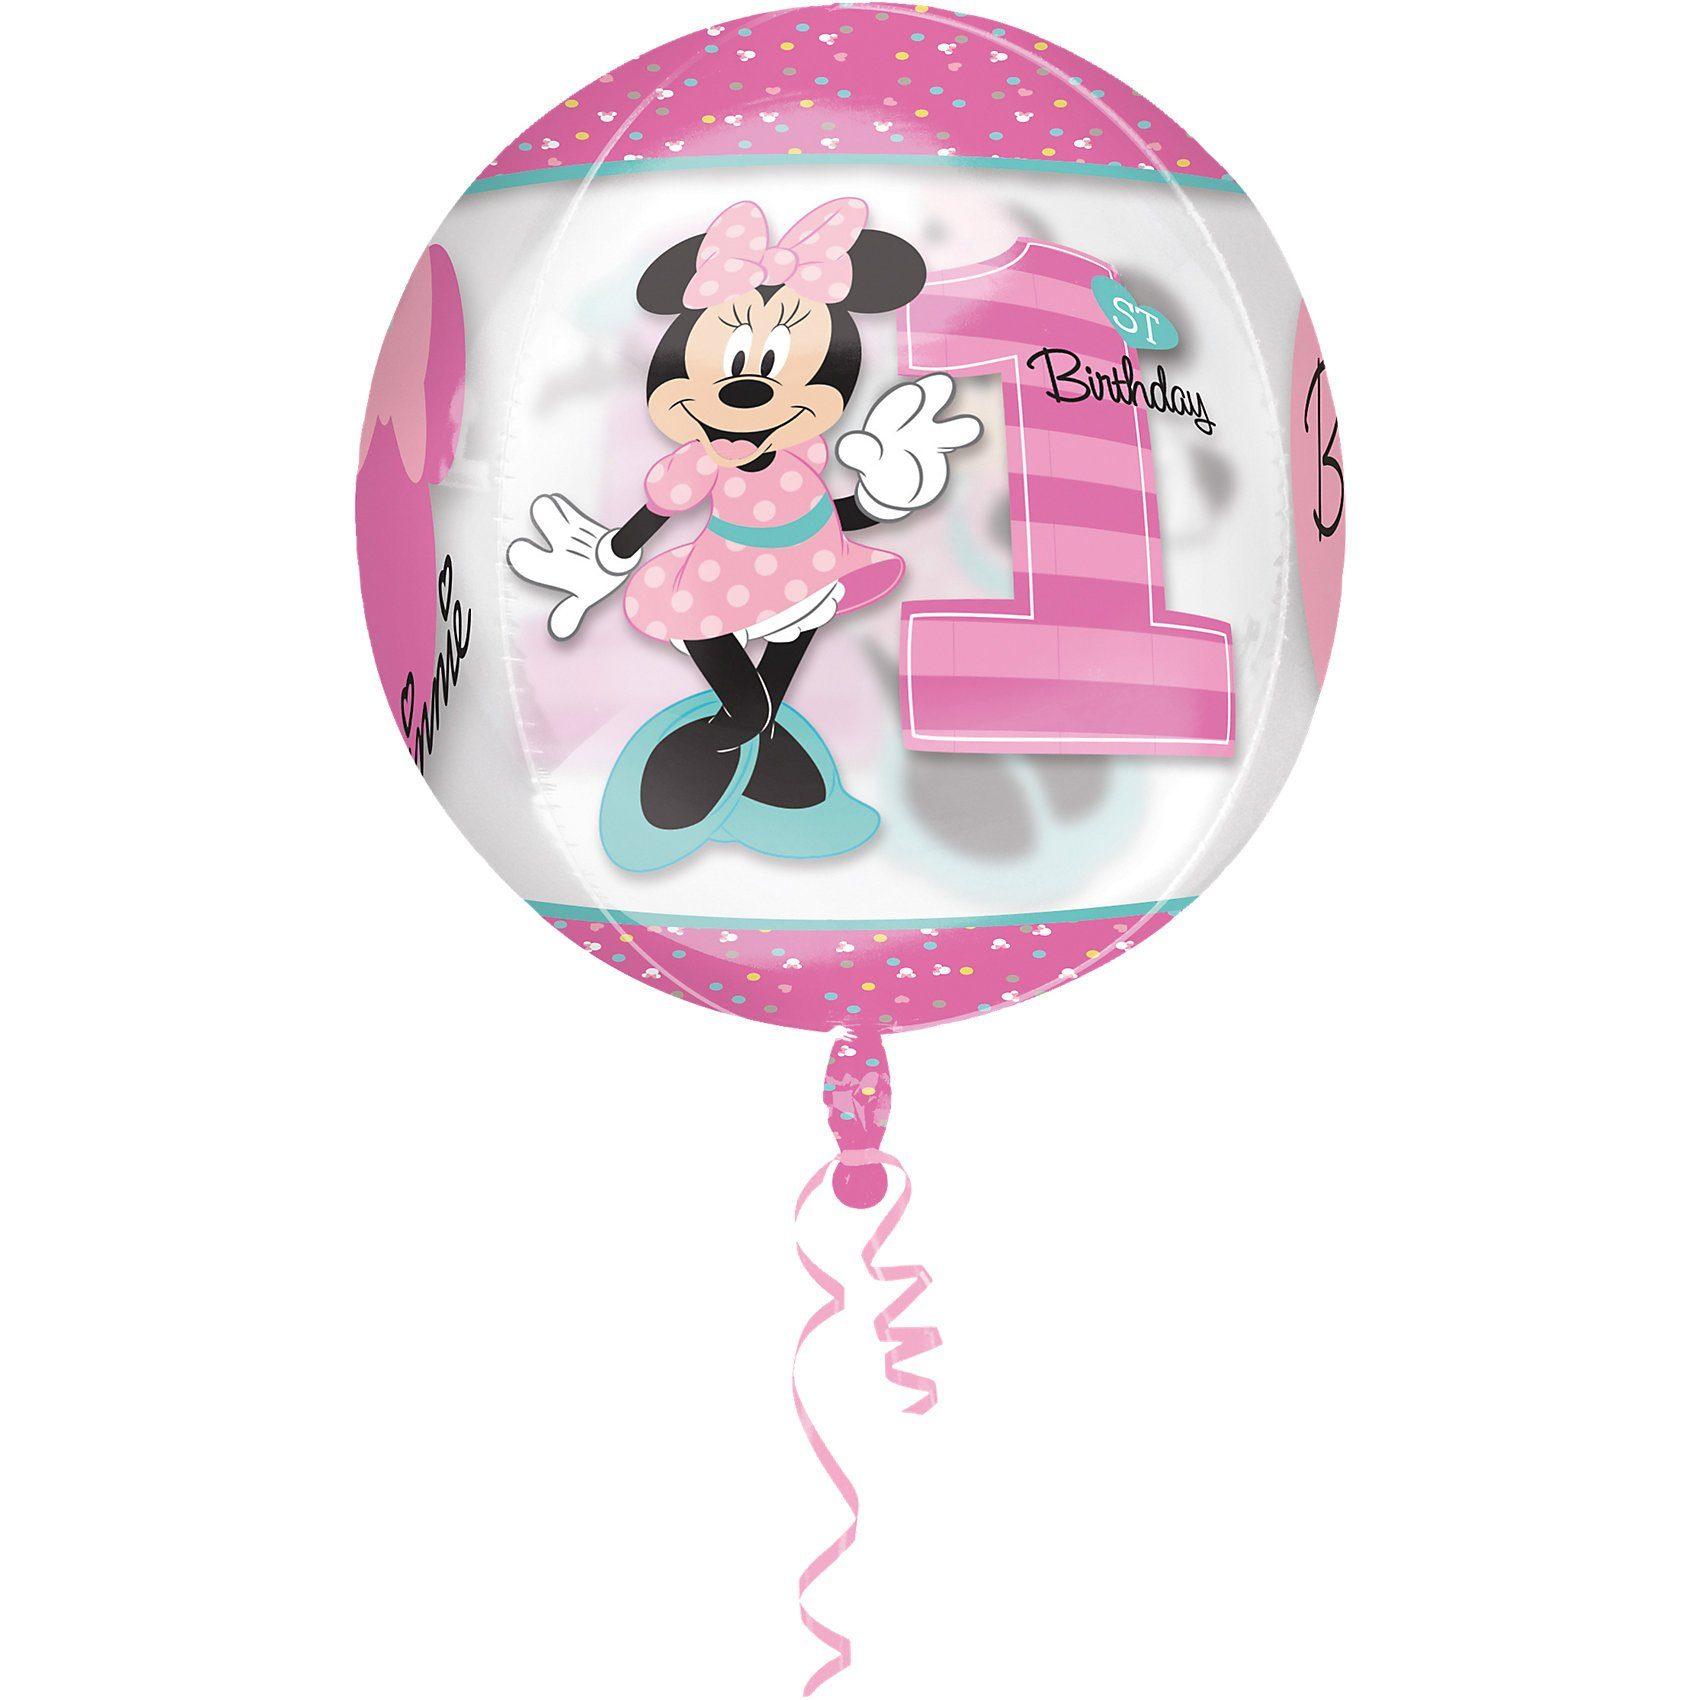 Amscan Folienballon Orbz Minnie Mouse - 1st Birthday